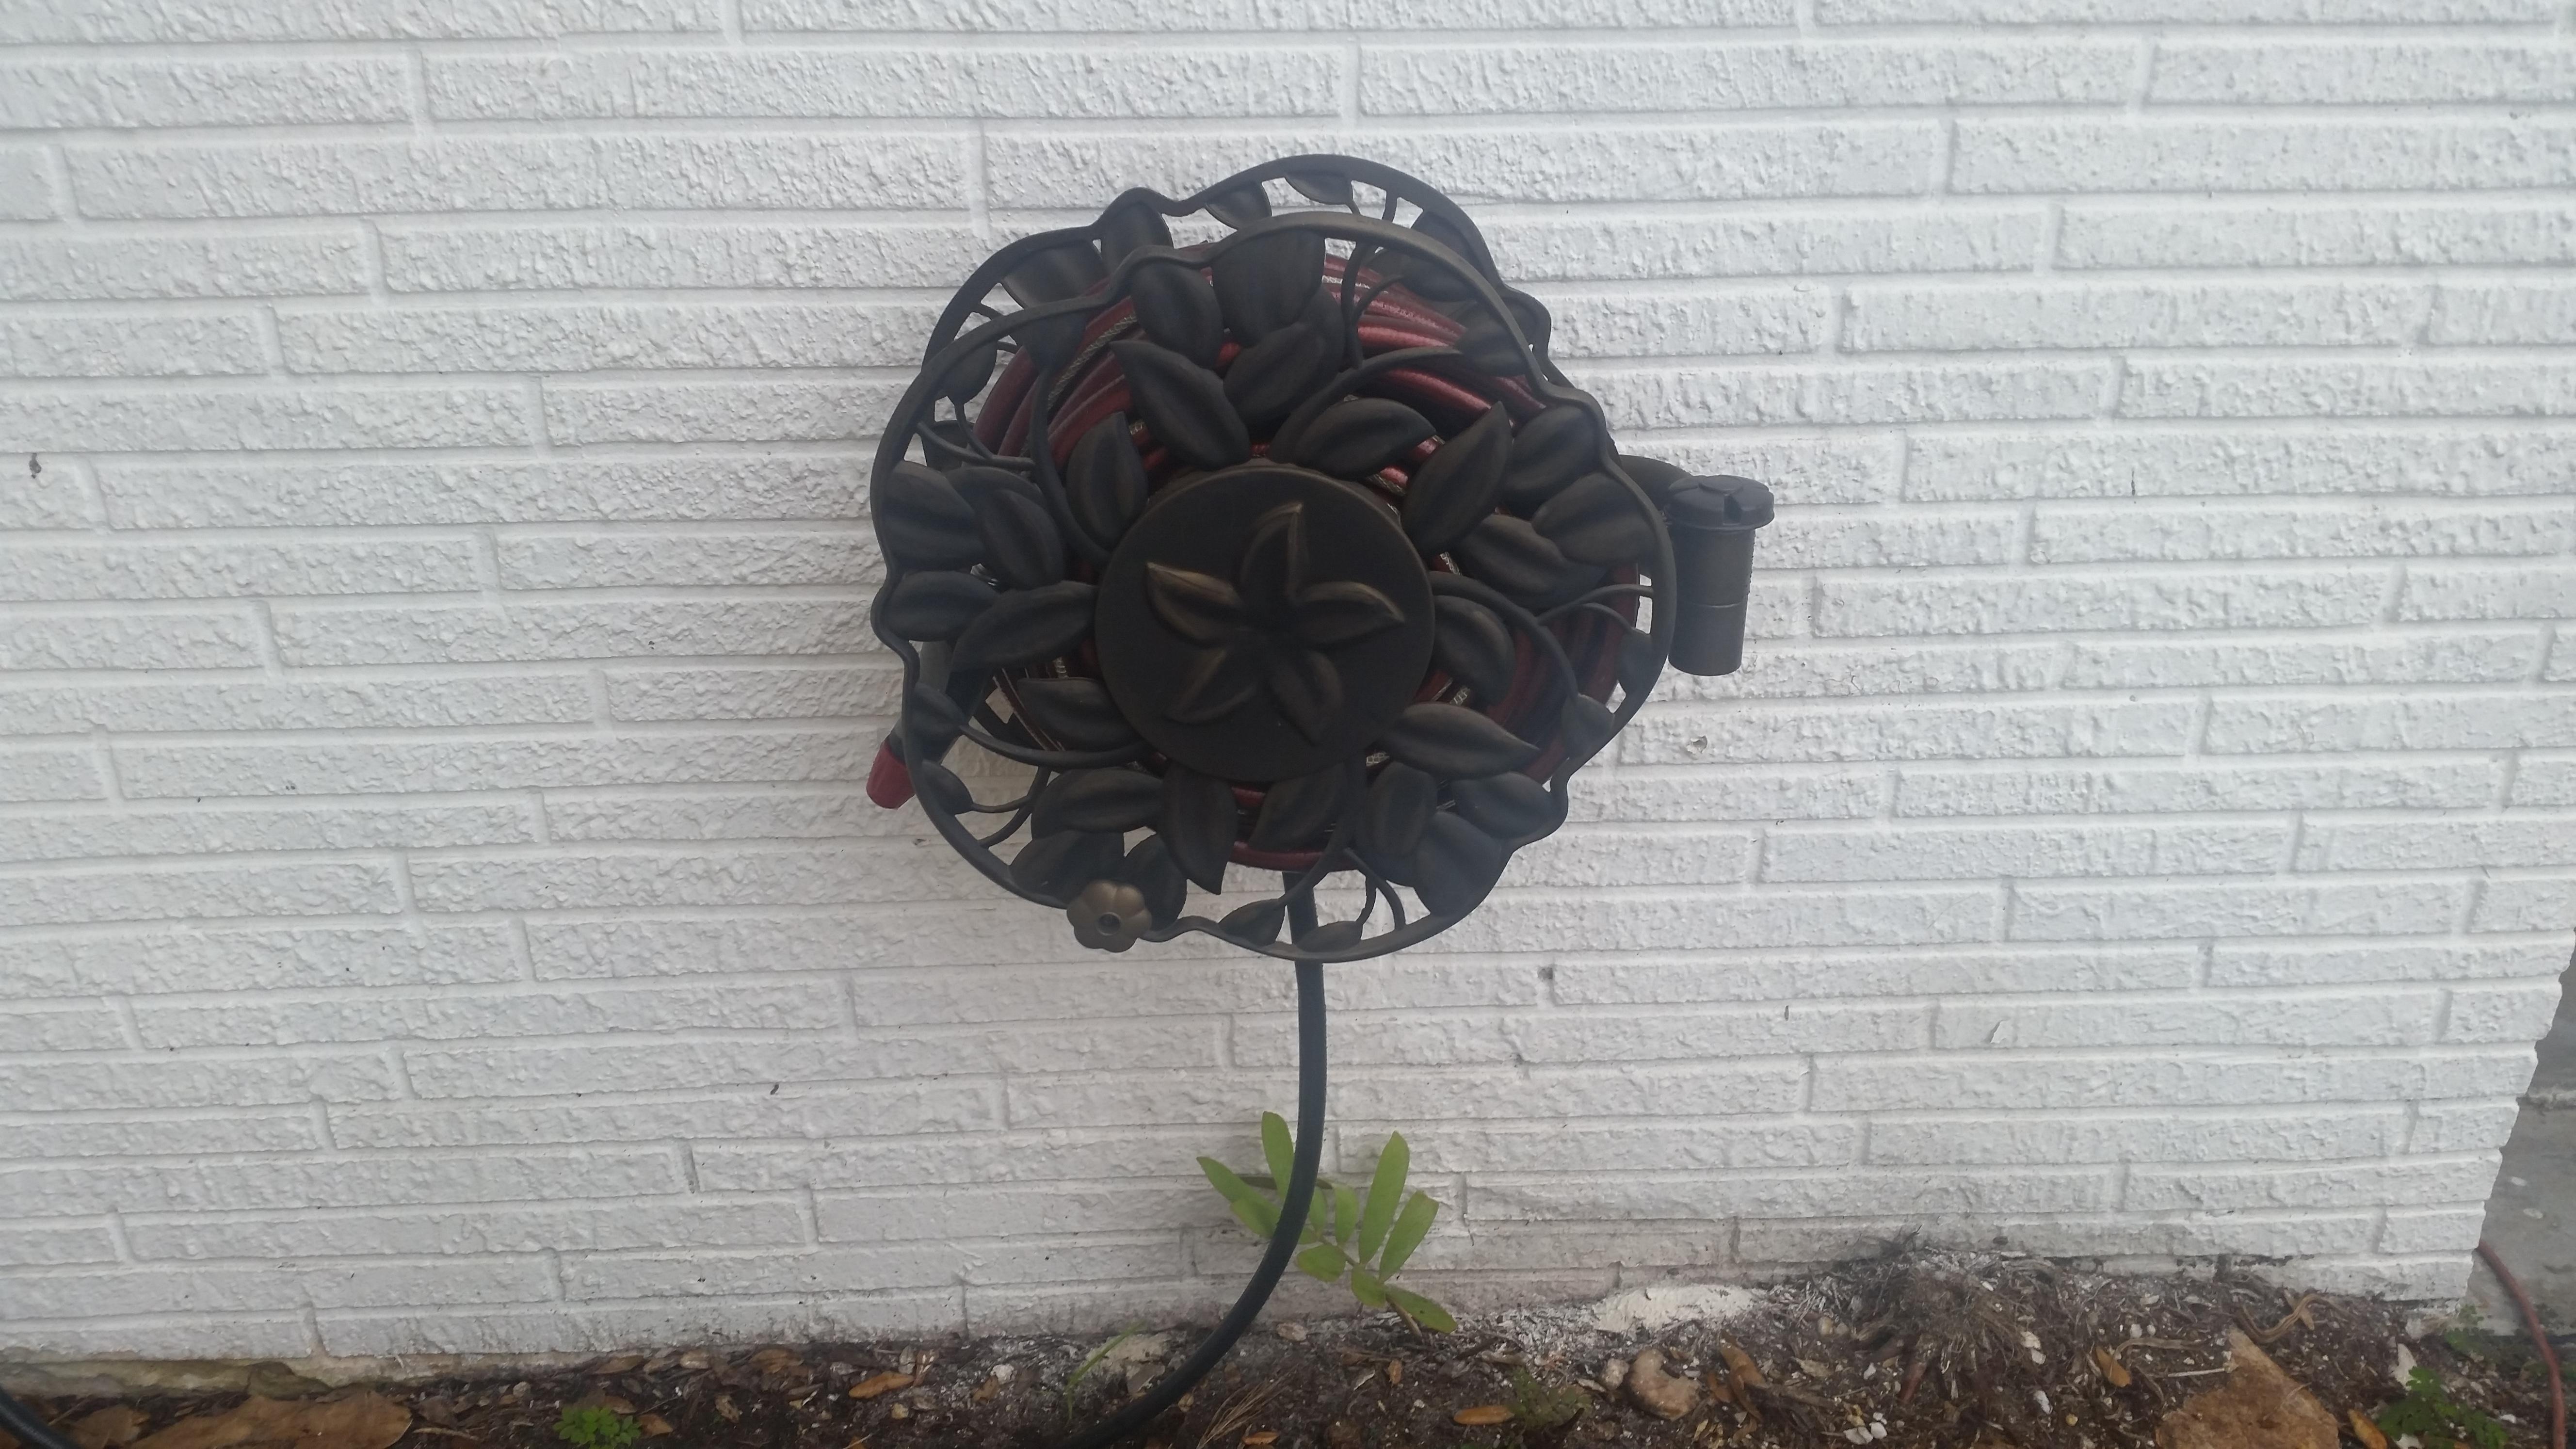 Installing a Garden Hose Reel